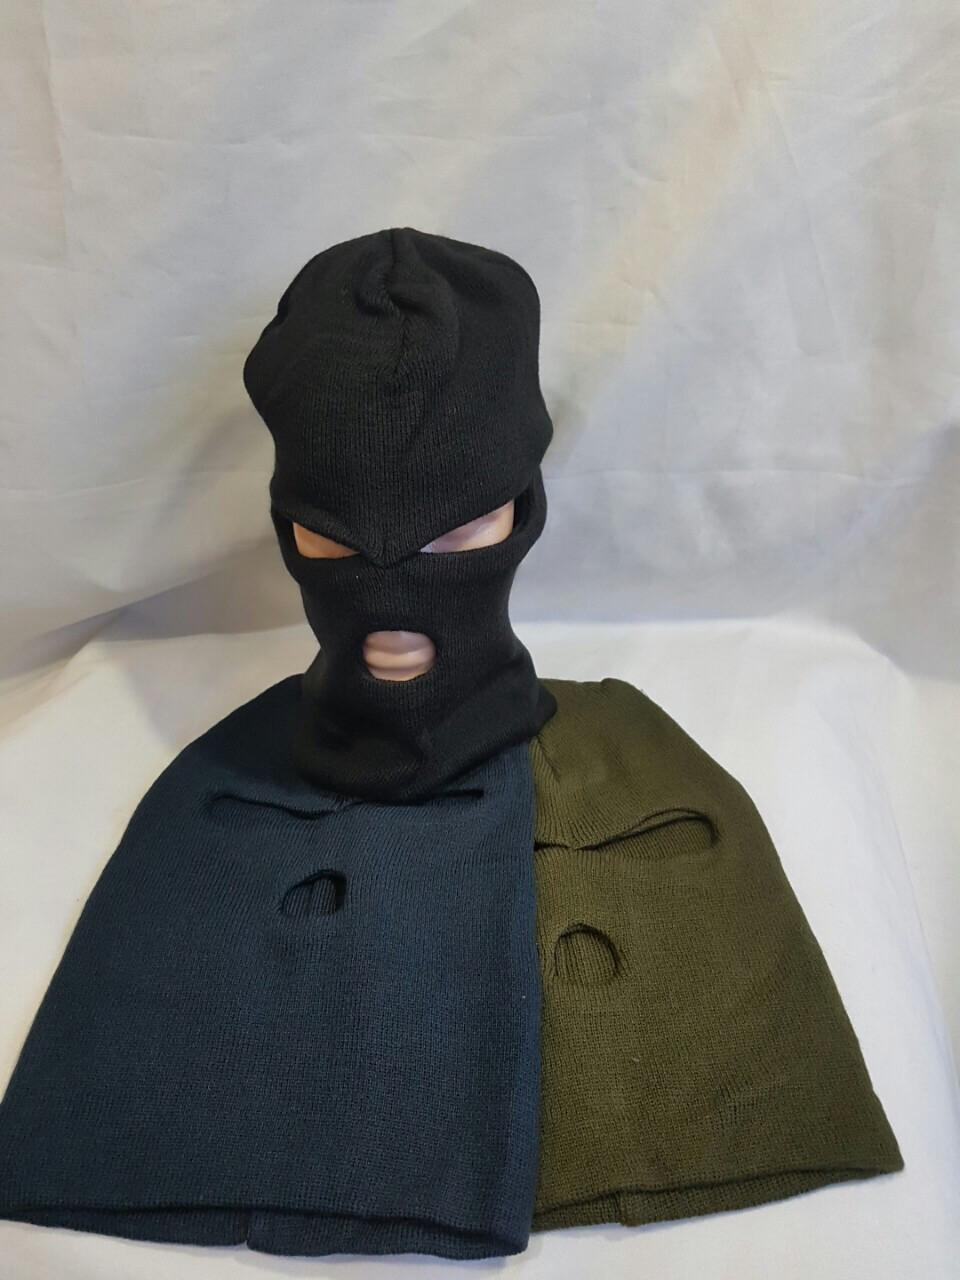 Шапка чоловіча в'язана шерсть+ акрил оптом зі складу в Одесі.